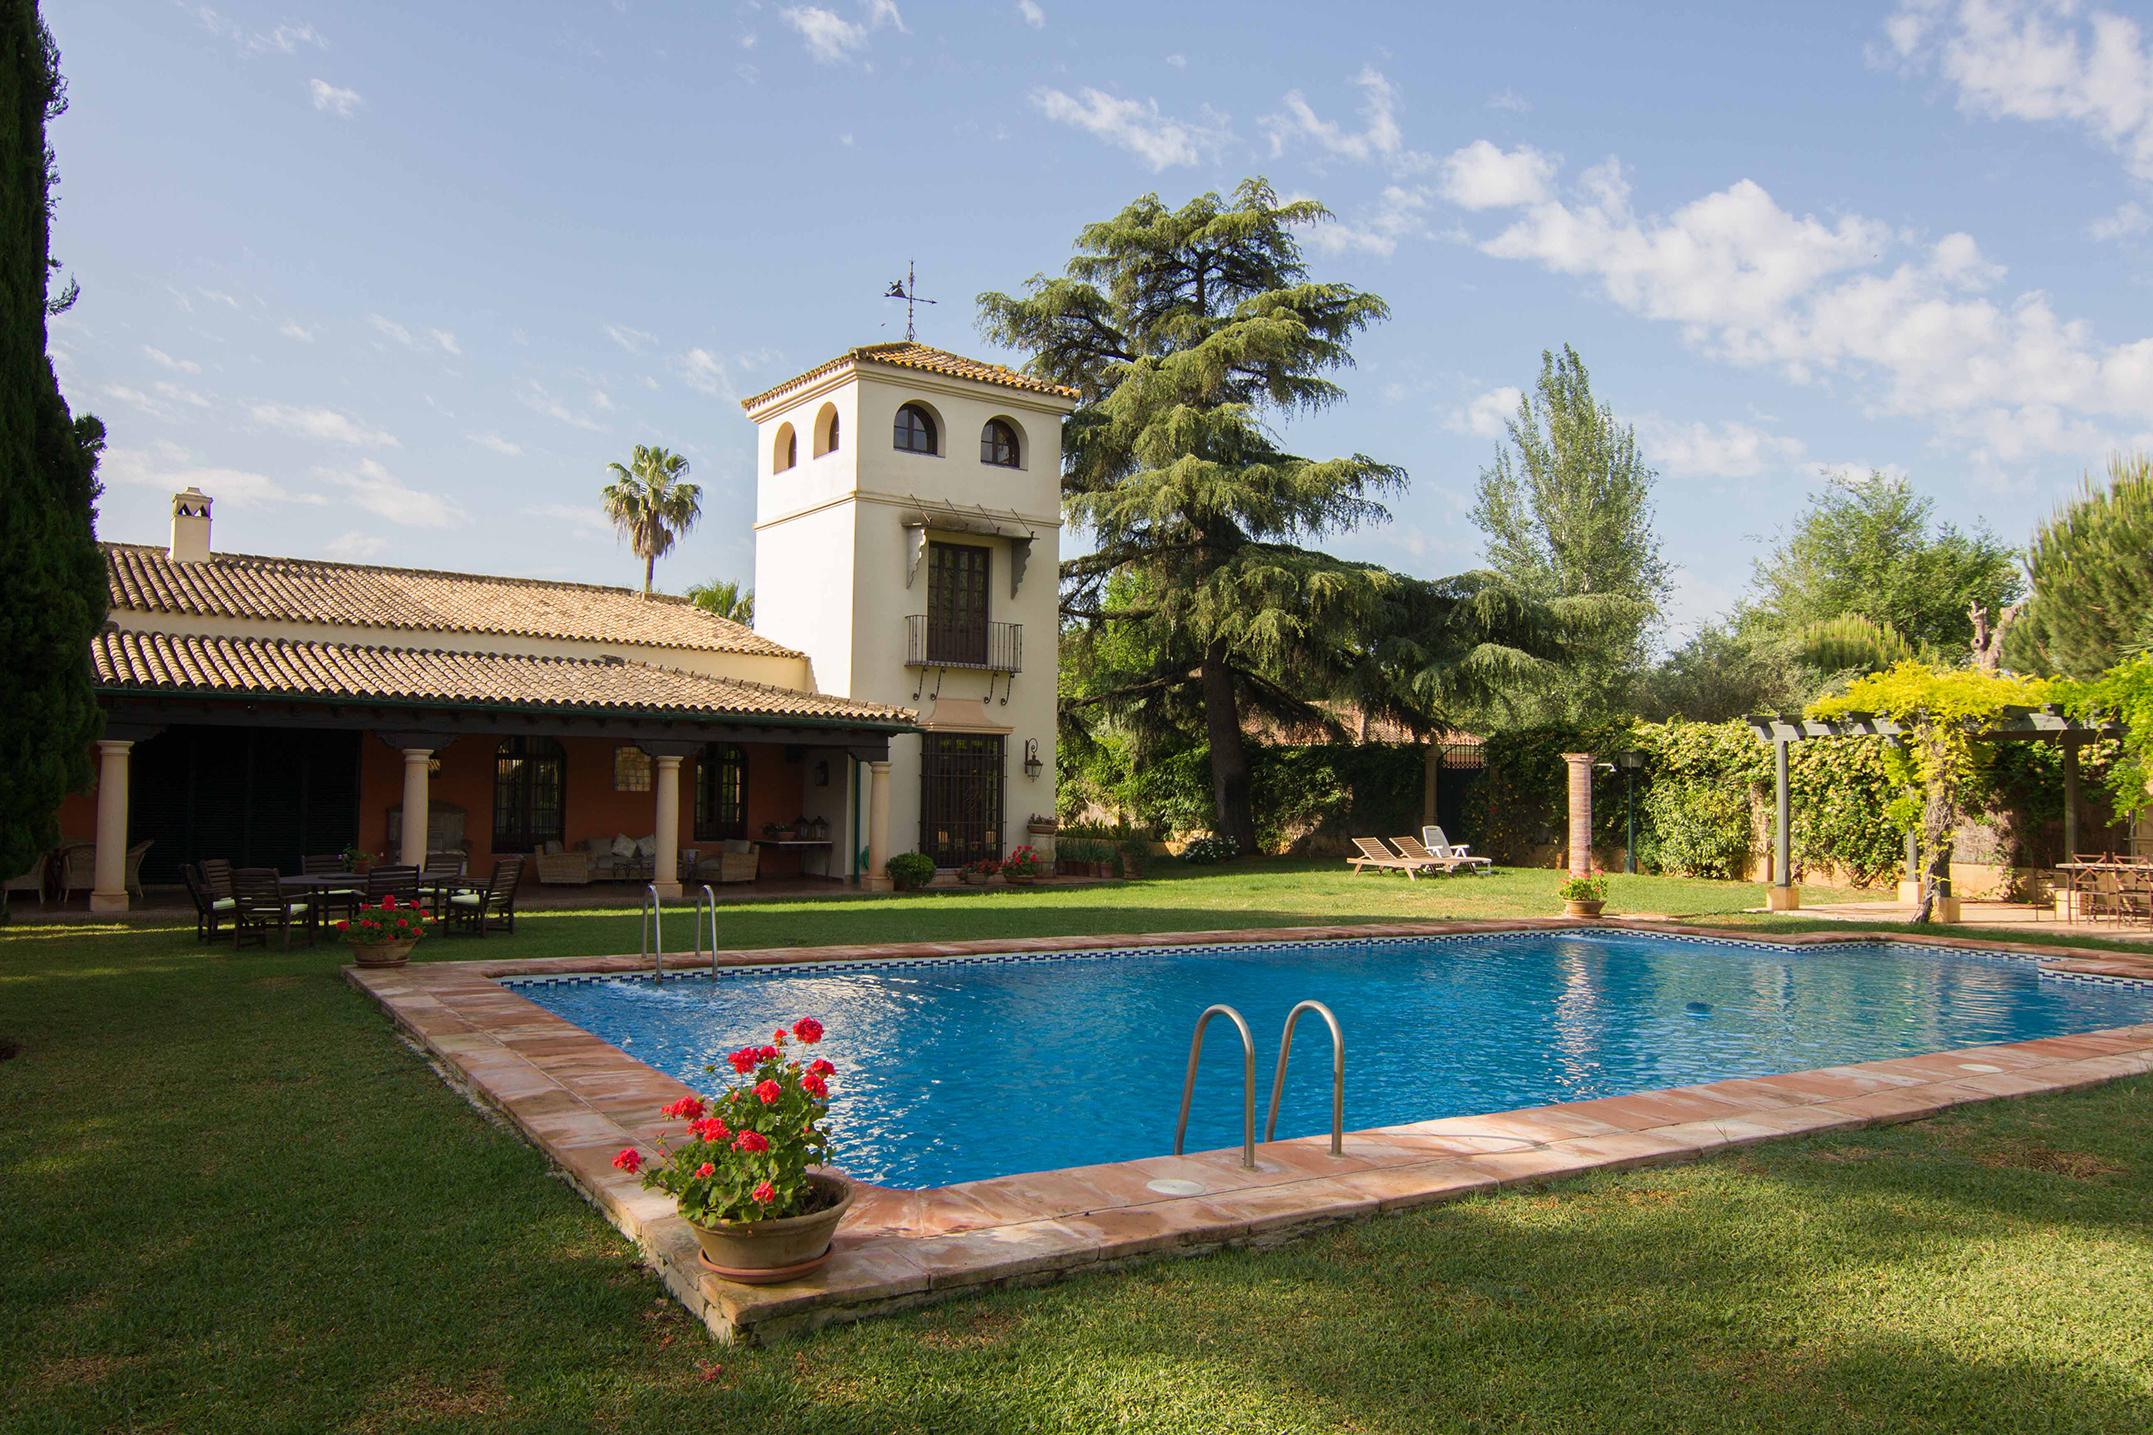 Maison unifamiliale pour l Vente à Exclusive villa in a private urbanization Sevilla, Andalousie, Espagne